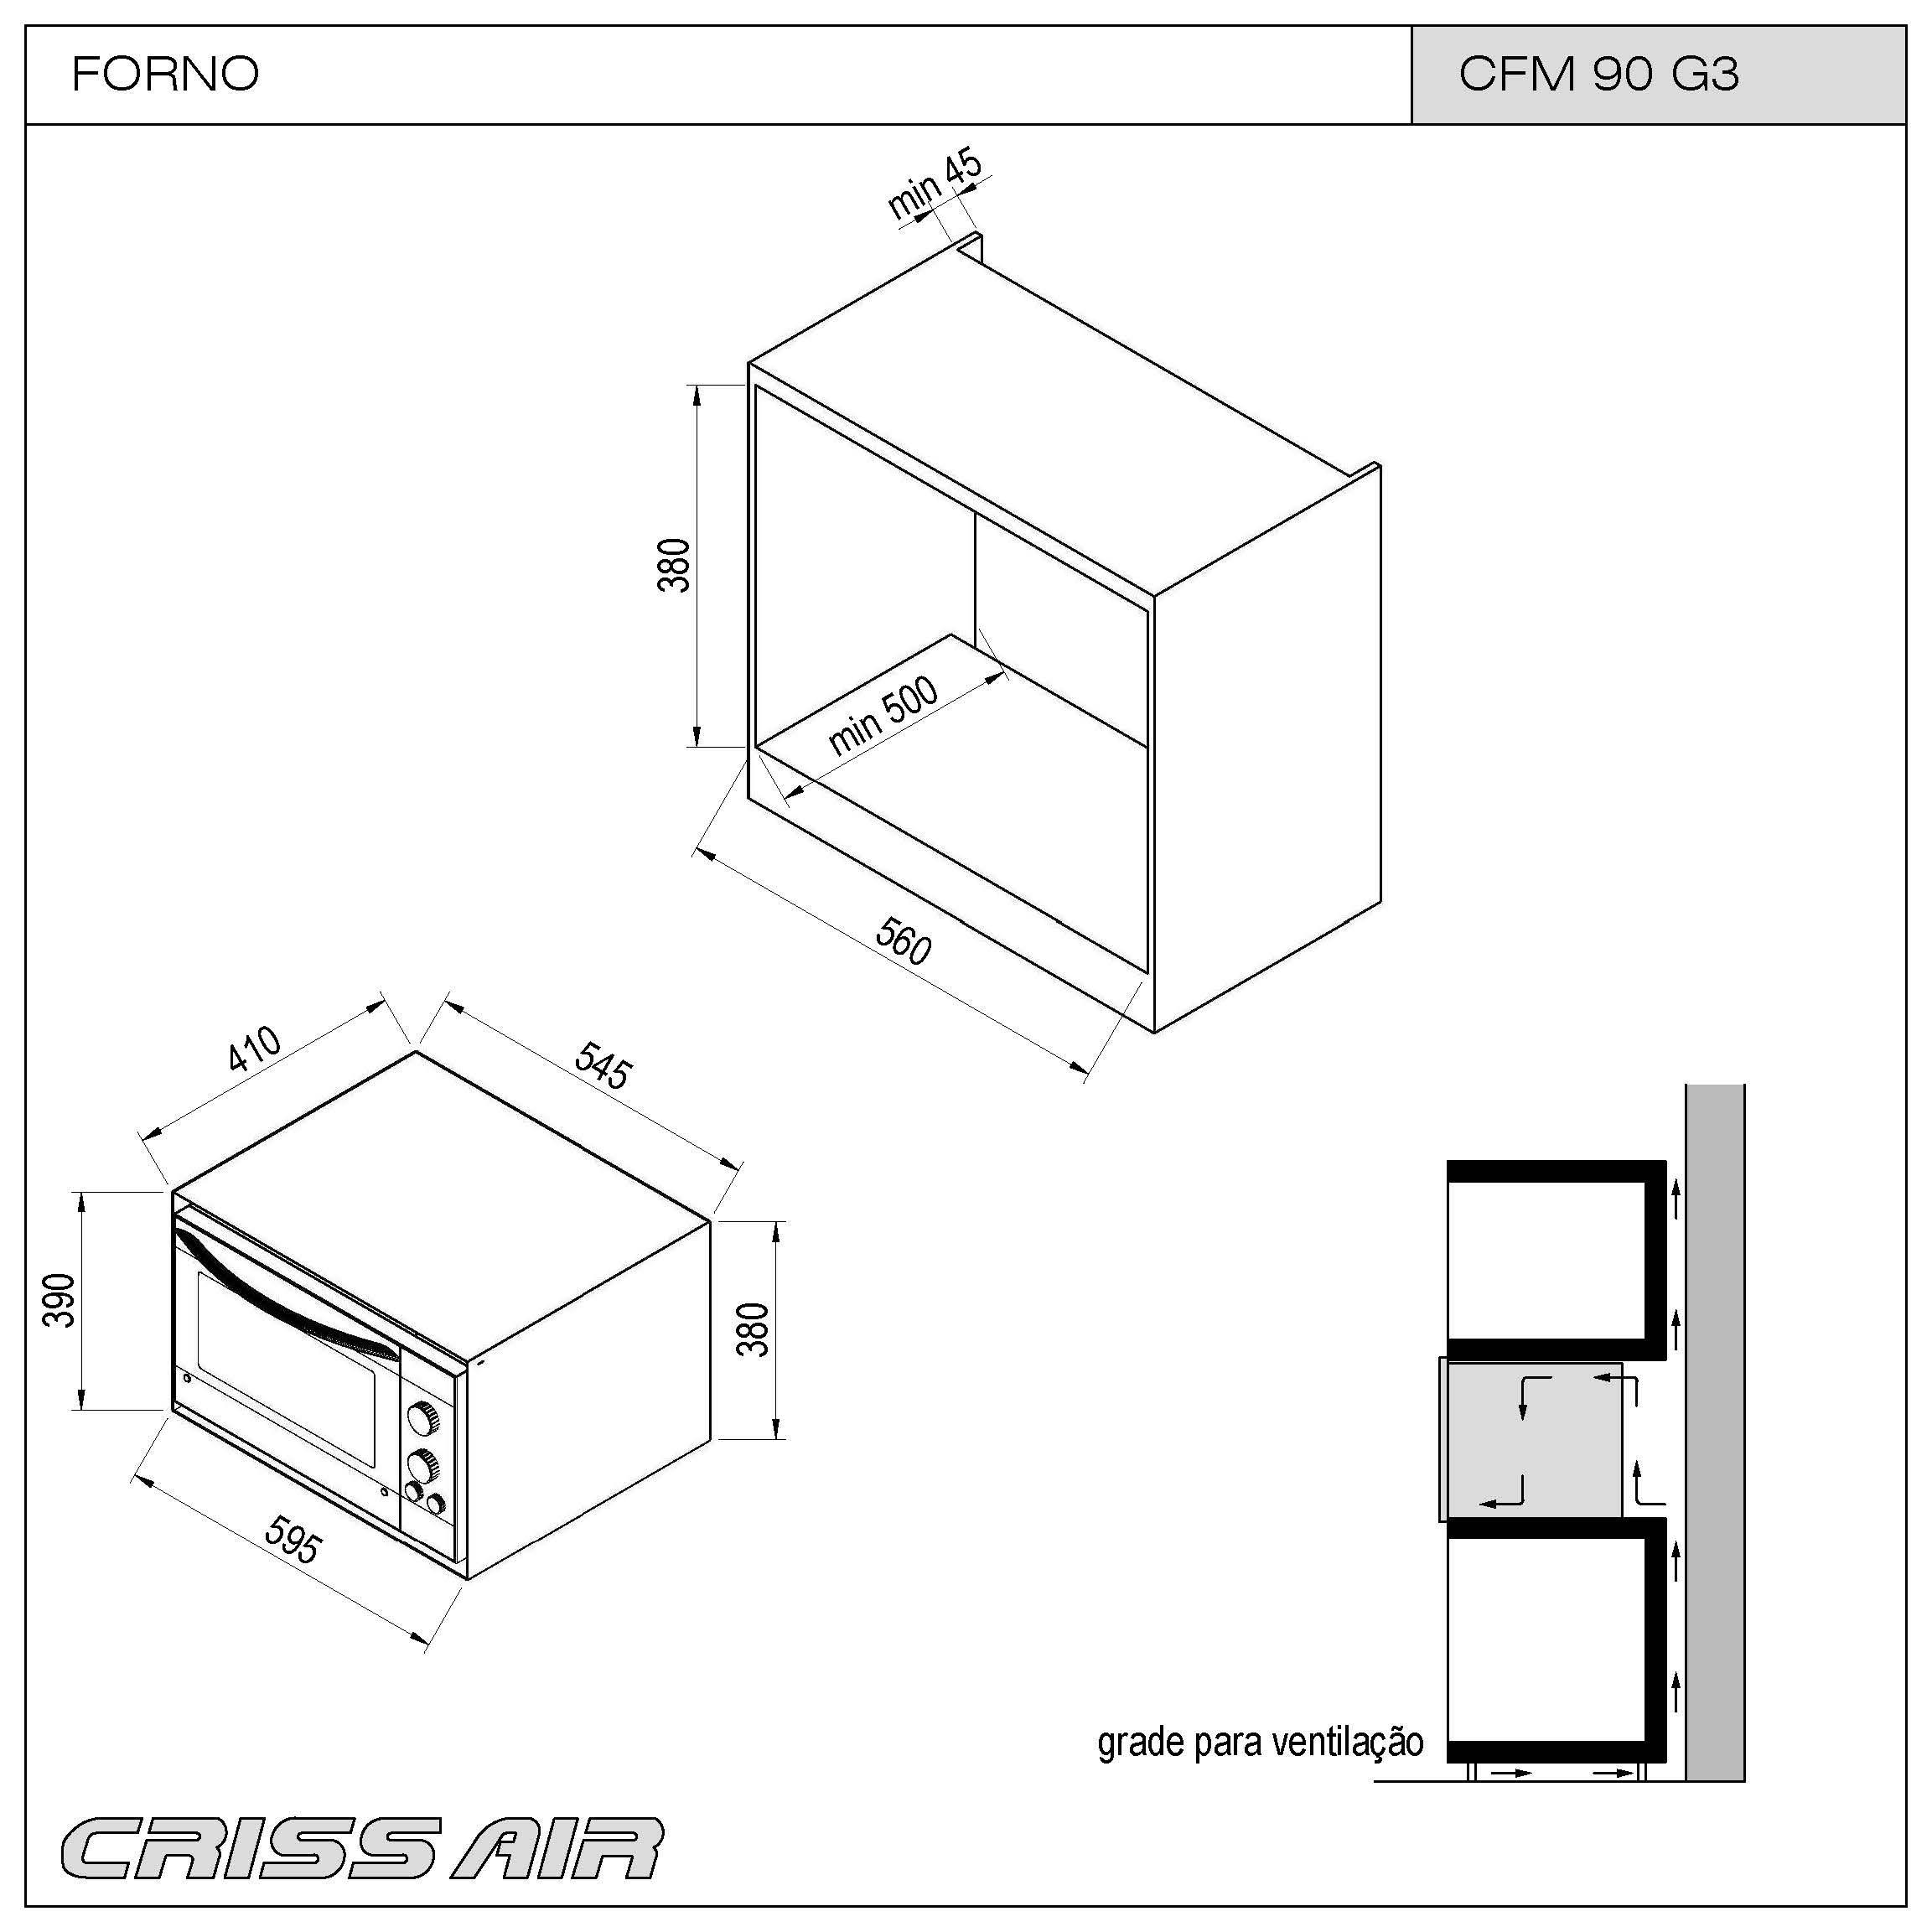 Micro-ondas CFM 90 G3